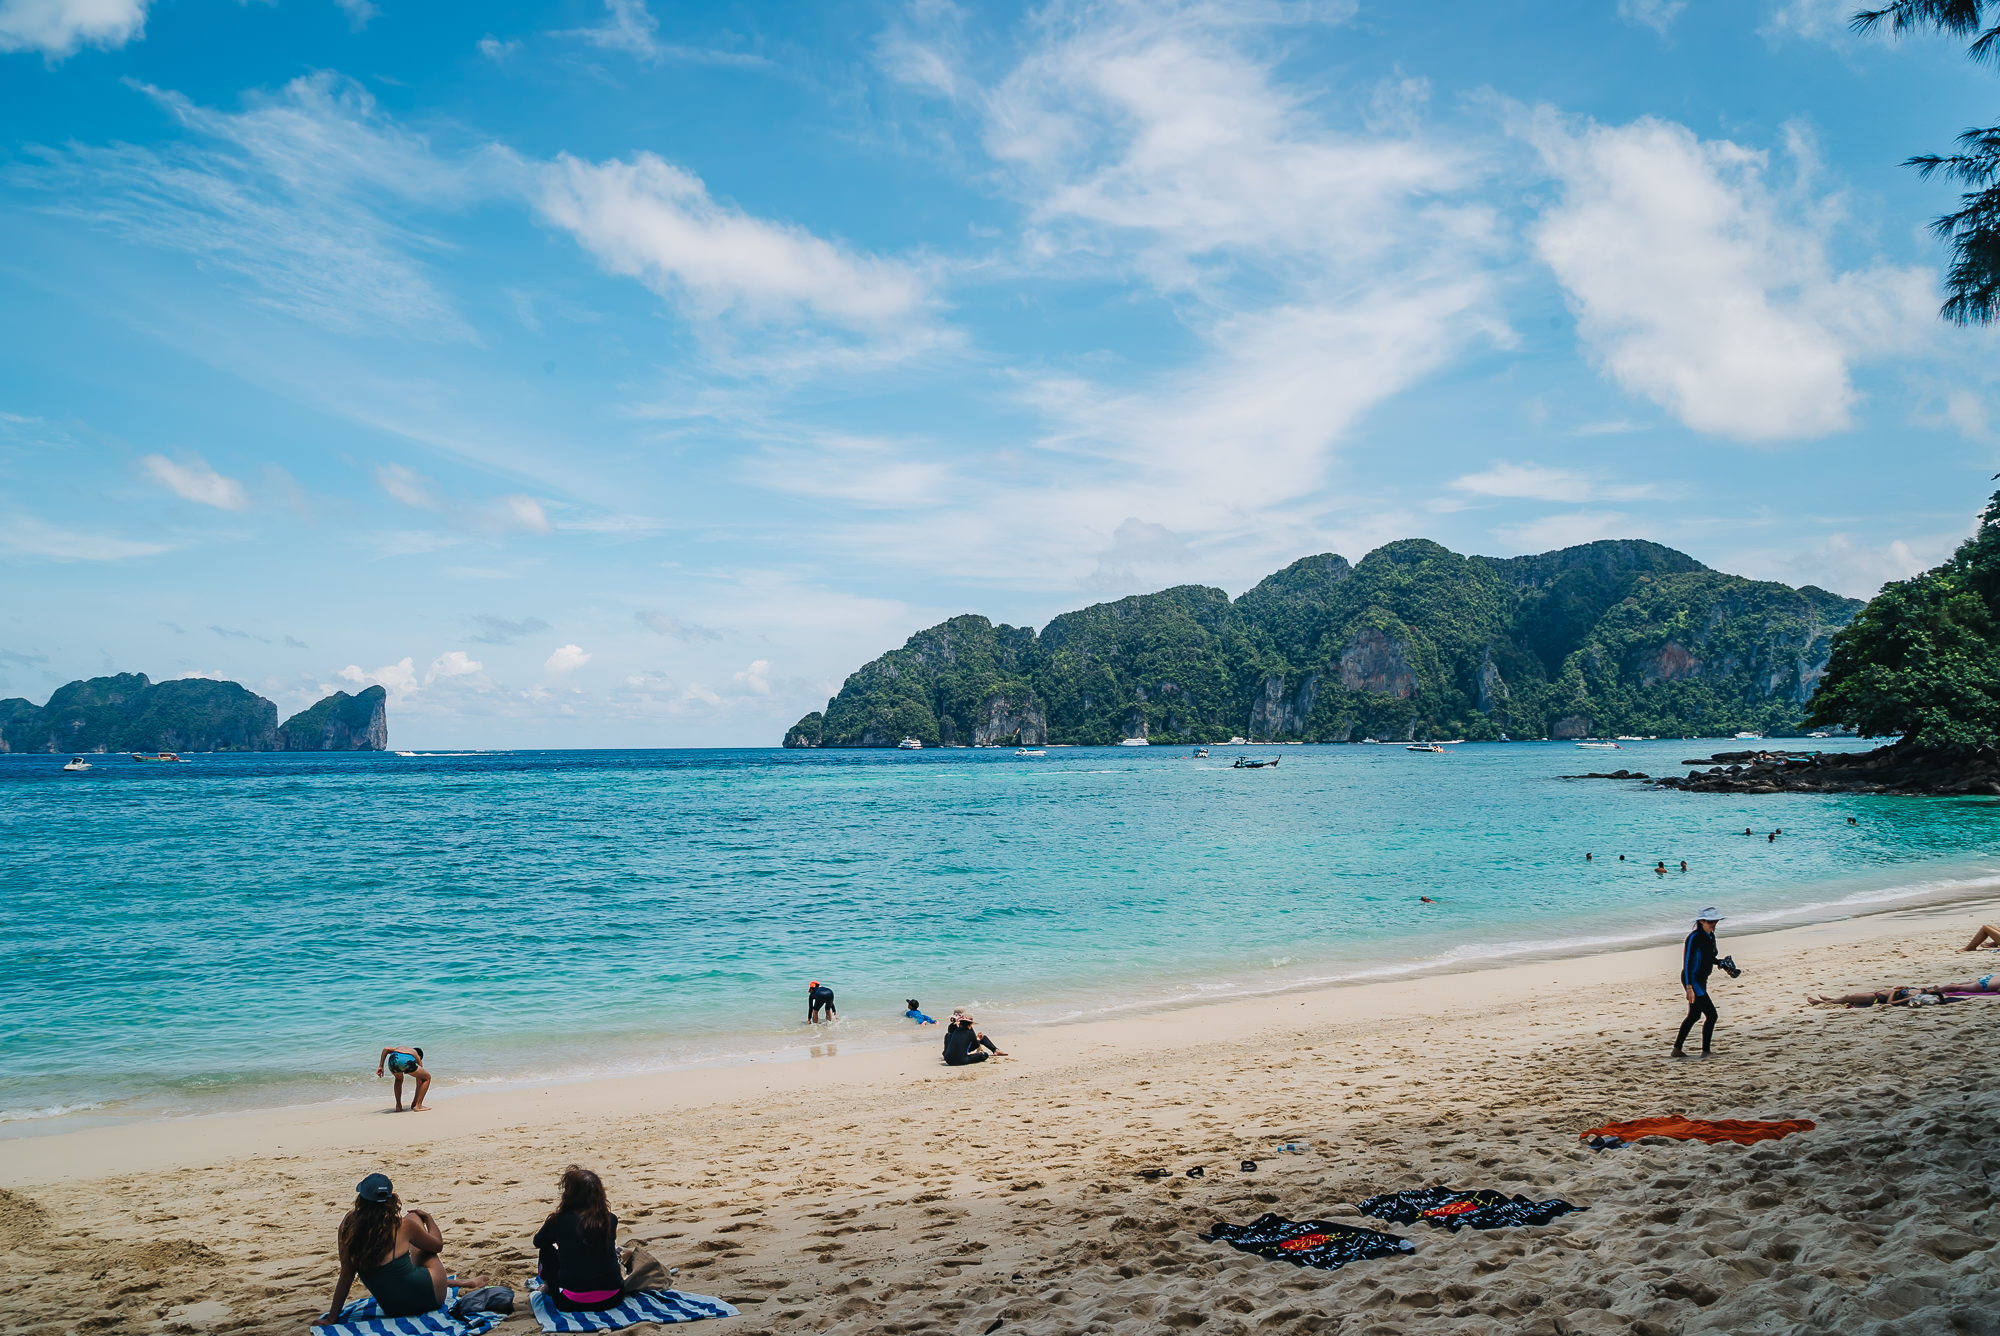 Relaxing beach stop of Phi Phi Islands